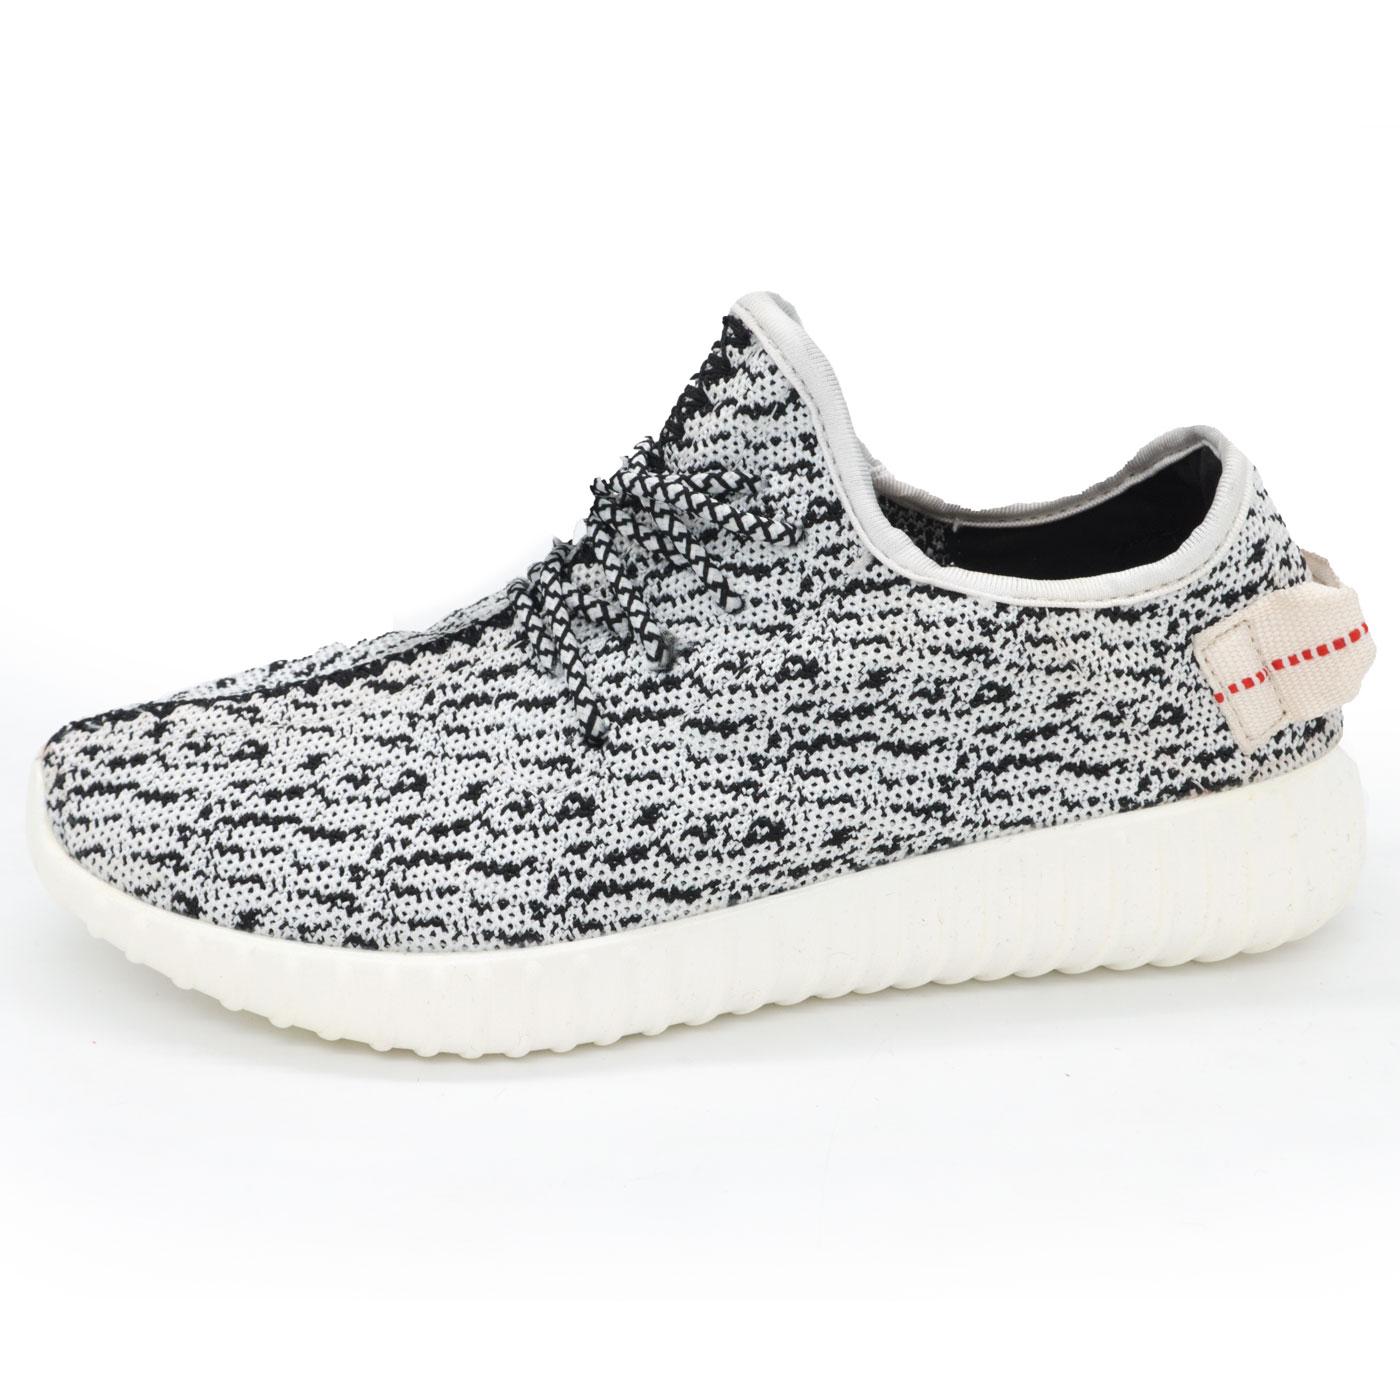 фото main Кроссовки Adidas Kanye West Yeezy 350 белые main